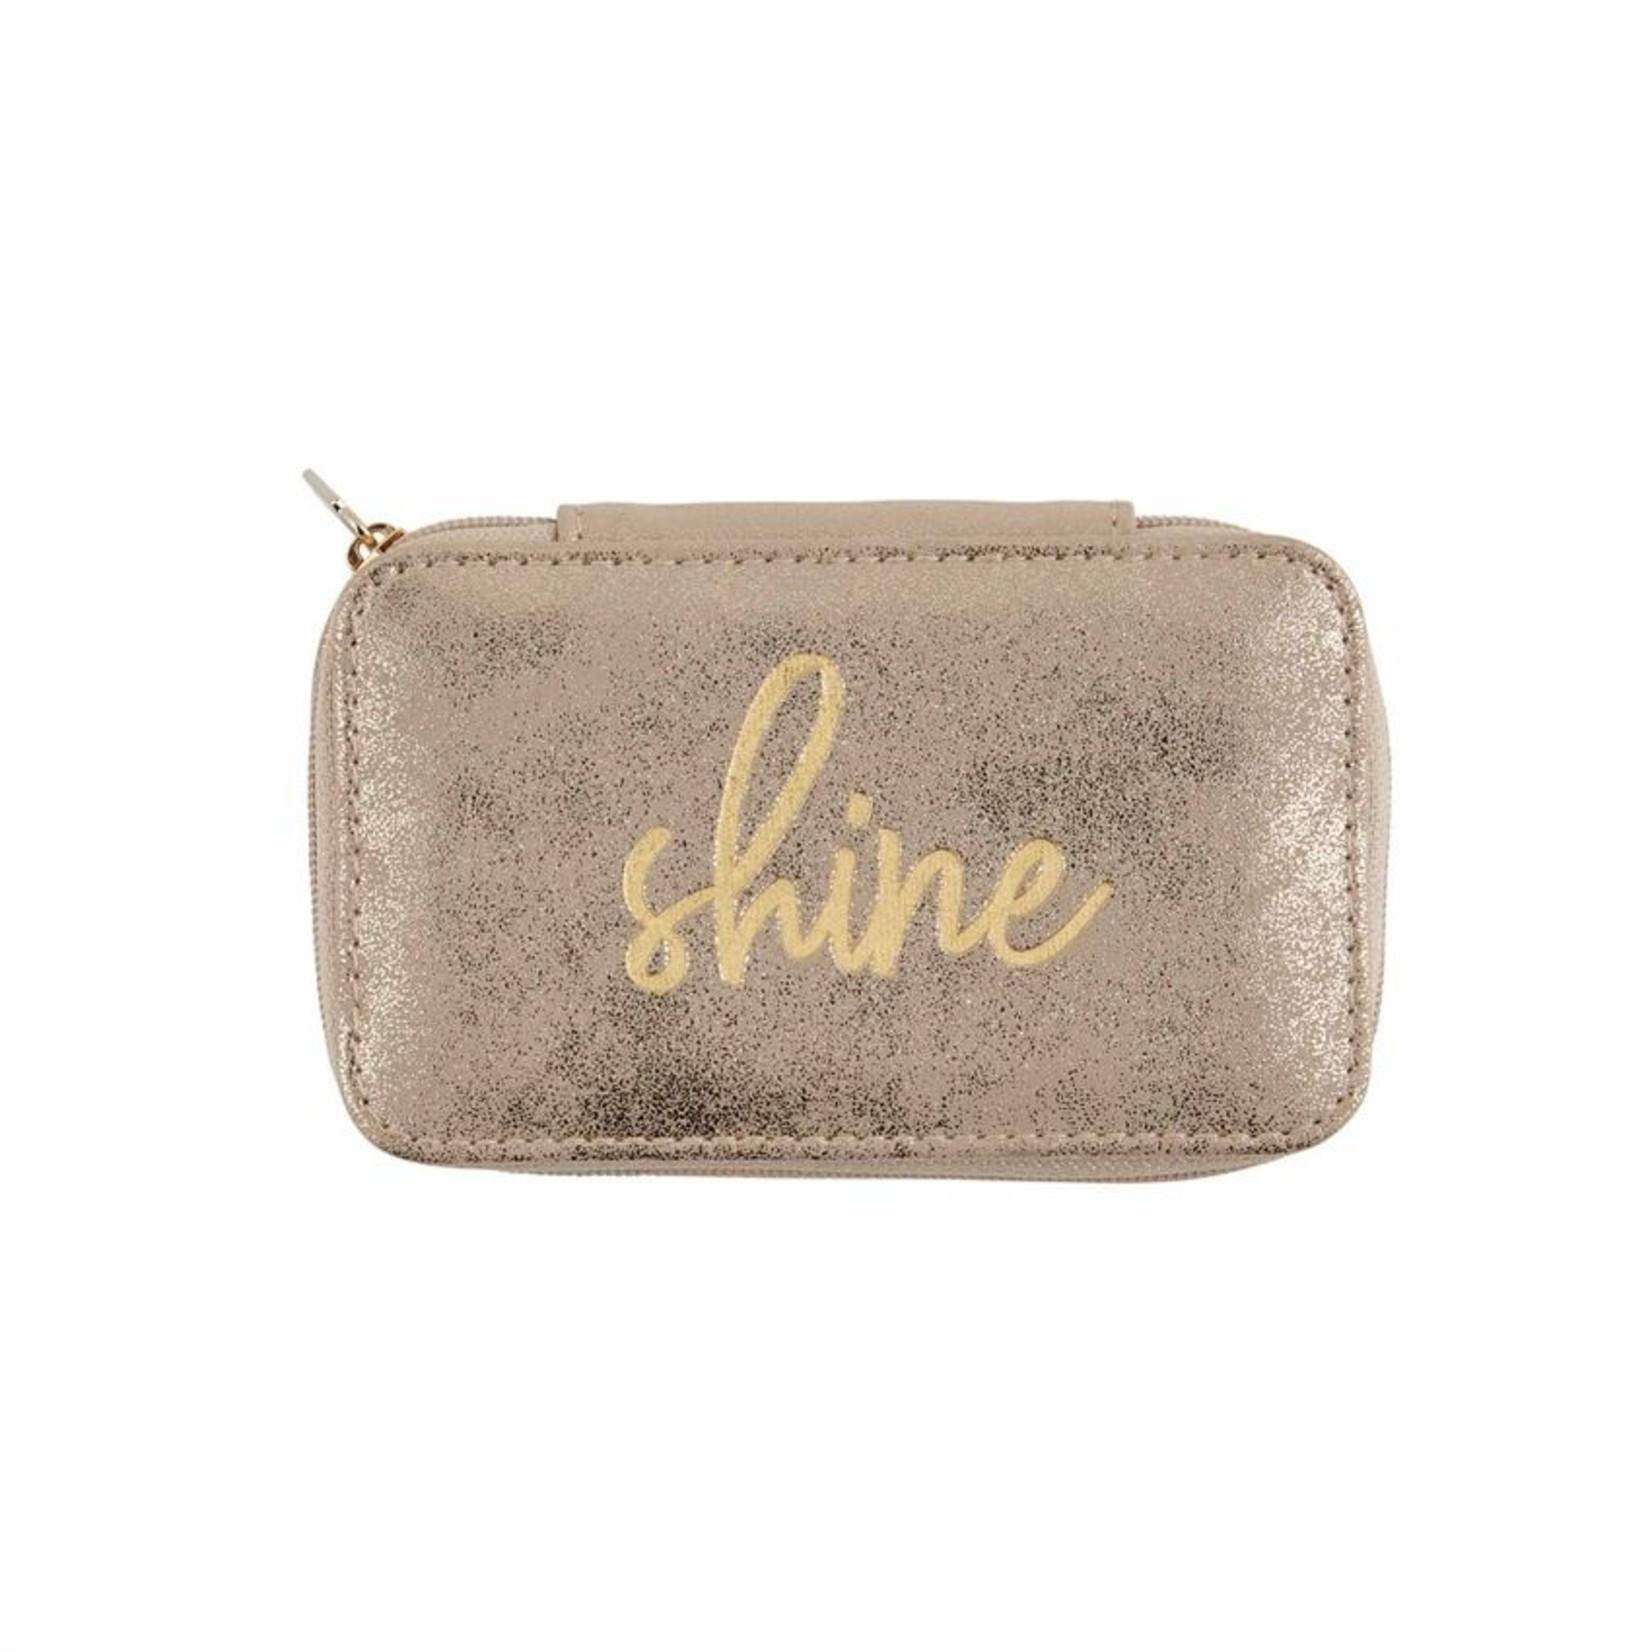 Shine Mini Jewelry Case in Gold